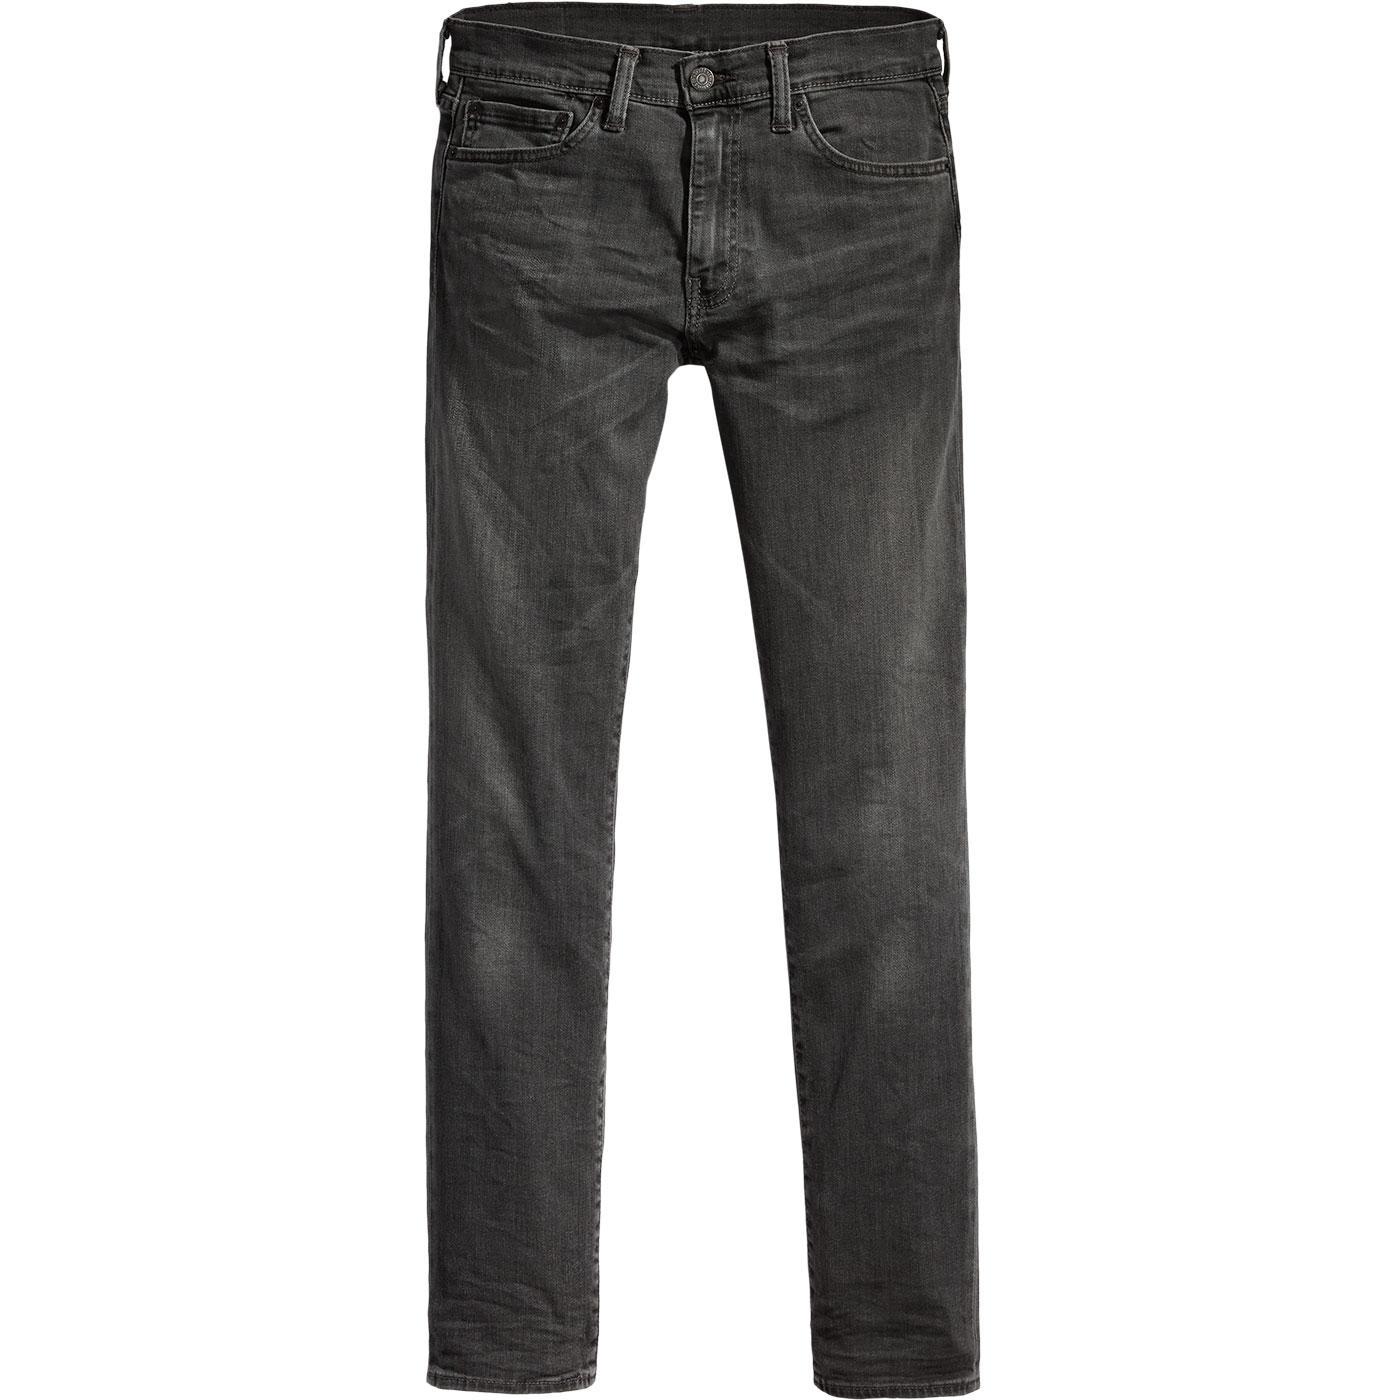 LEVI'S 511 Slim Stretch Denim Jeans HEADED EAST